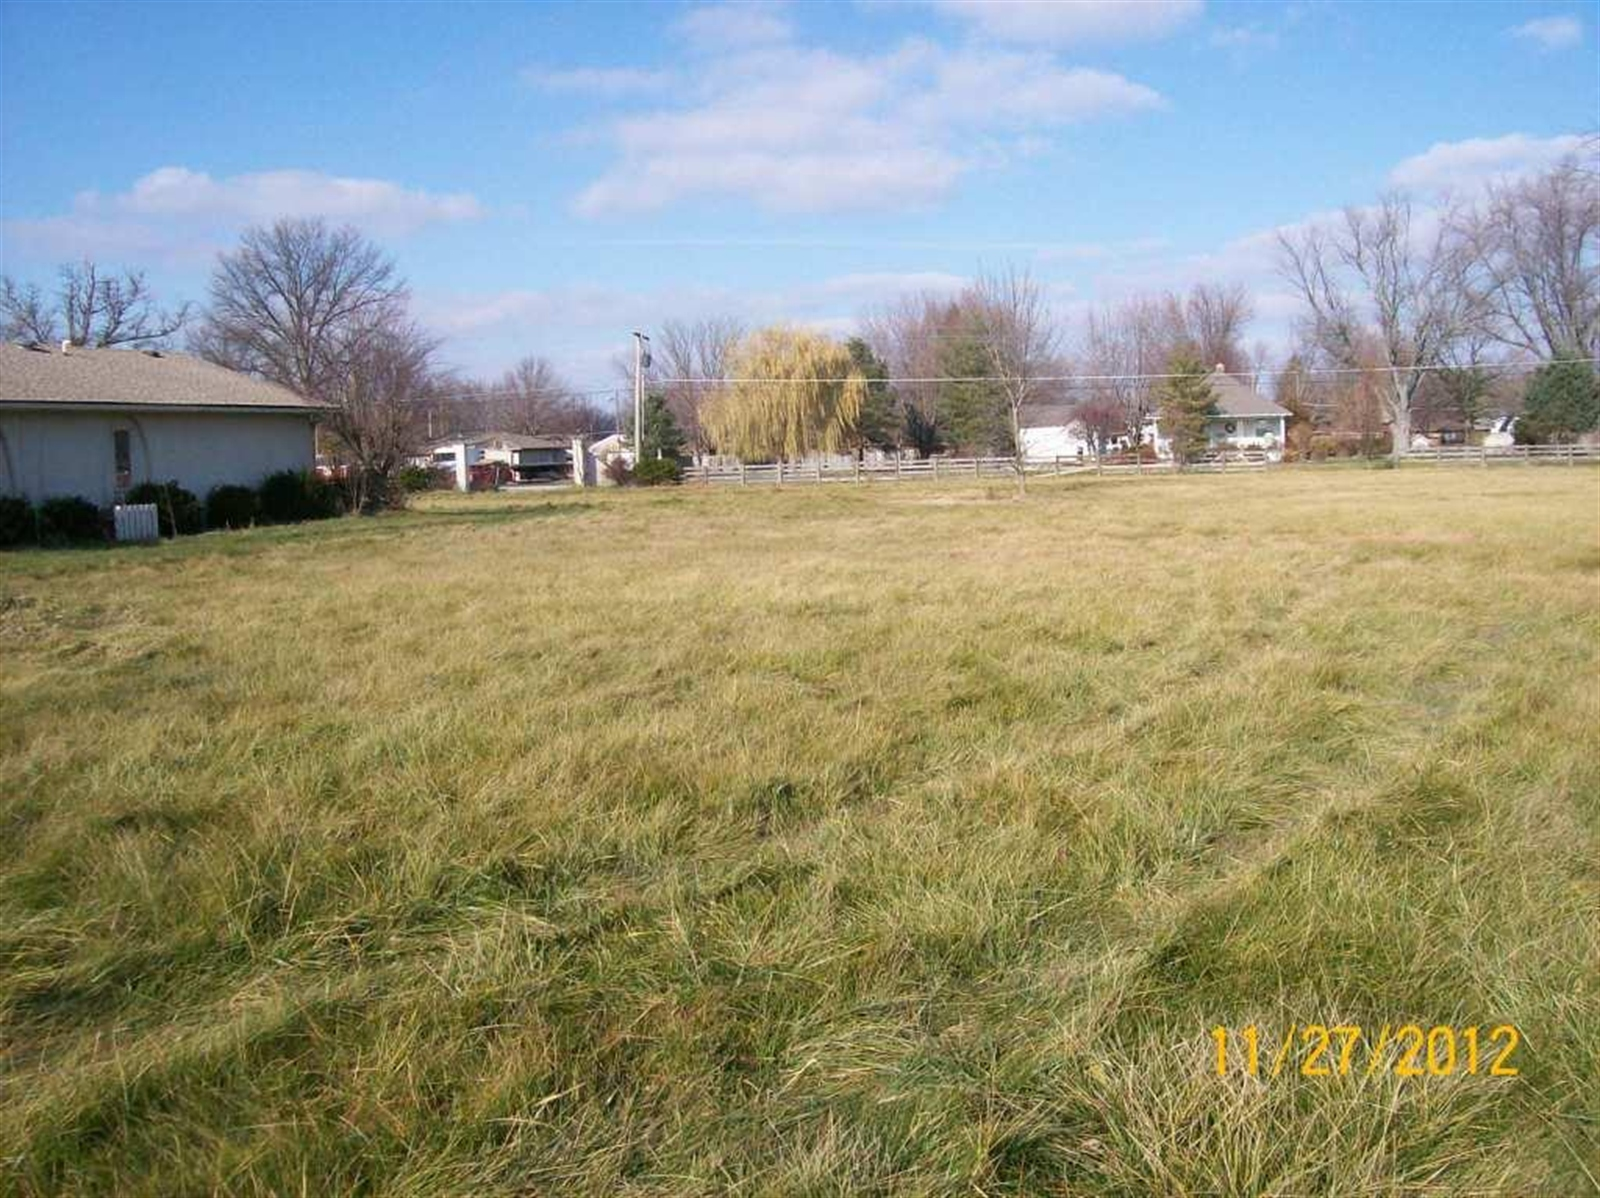 Real Estate Photography - 3077 E SR 236, ANDERSON, IN, 46011 - Location 15